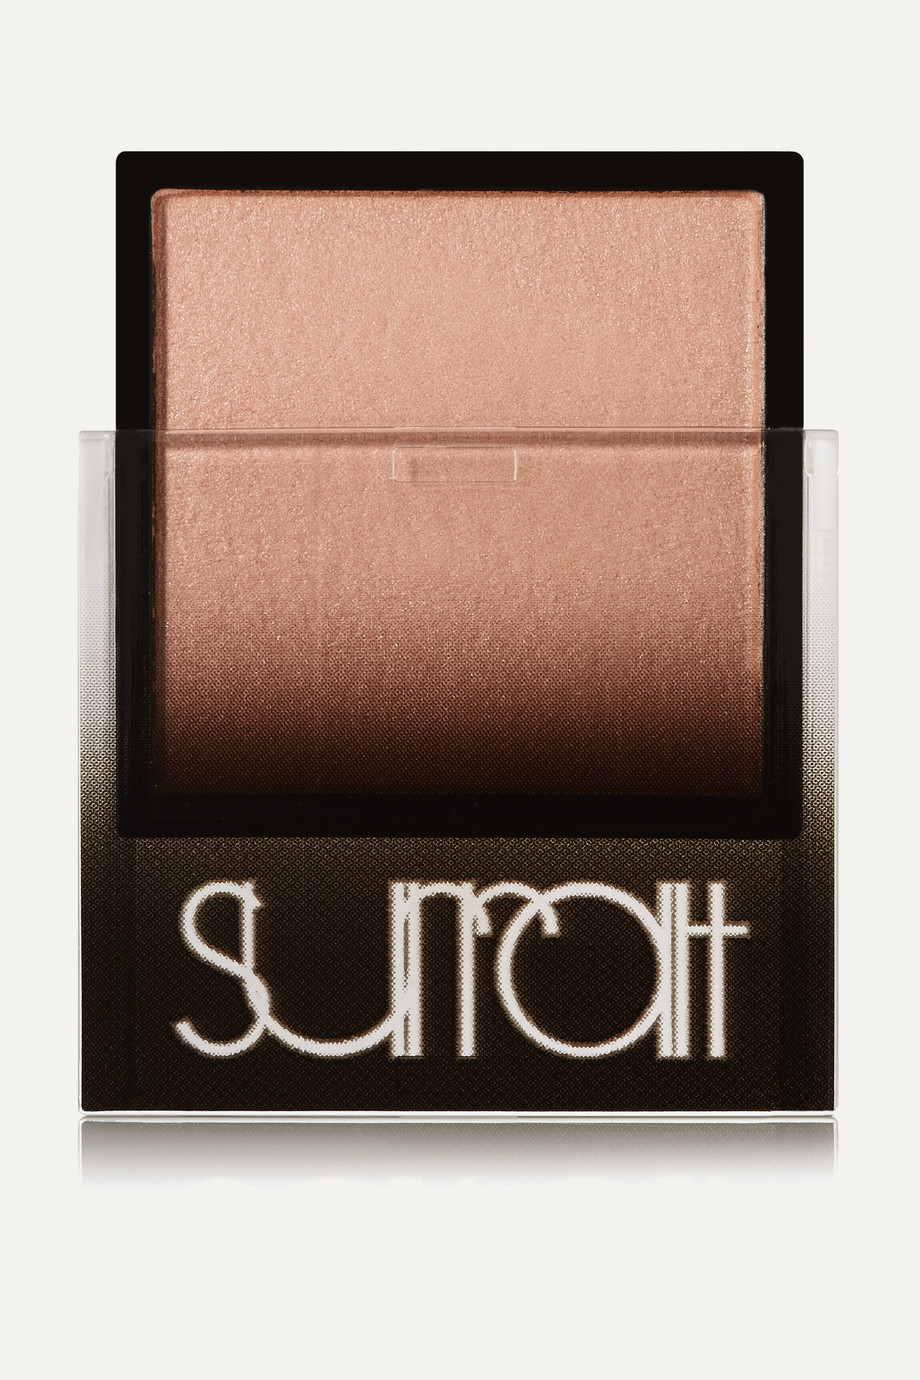 Surratt Beauty Artistique Eyeshadow - Poudre 4